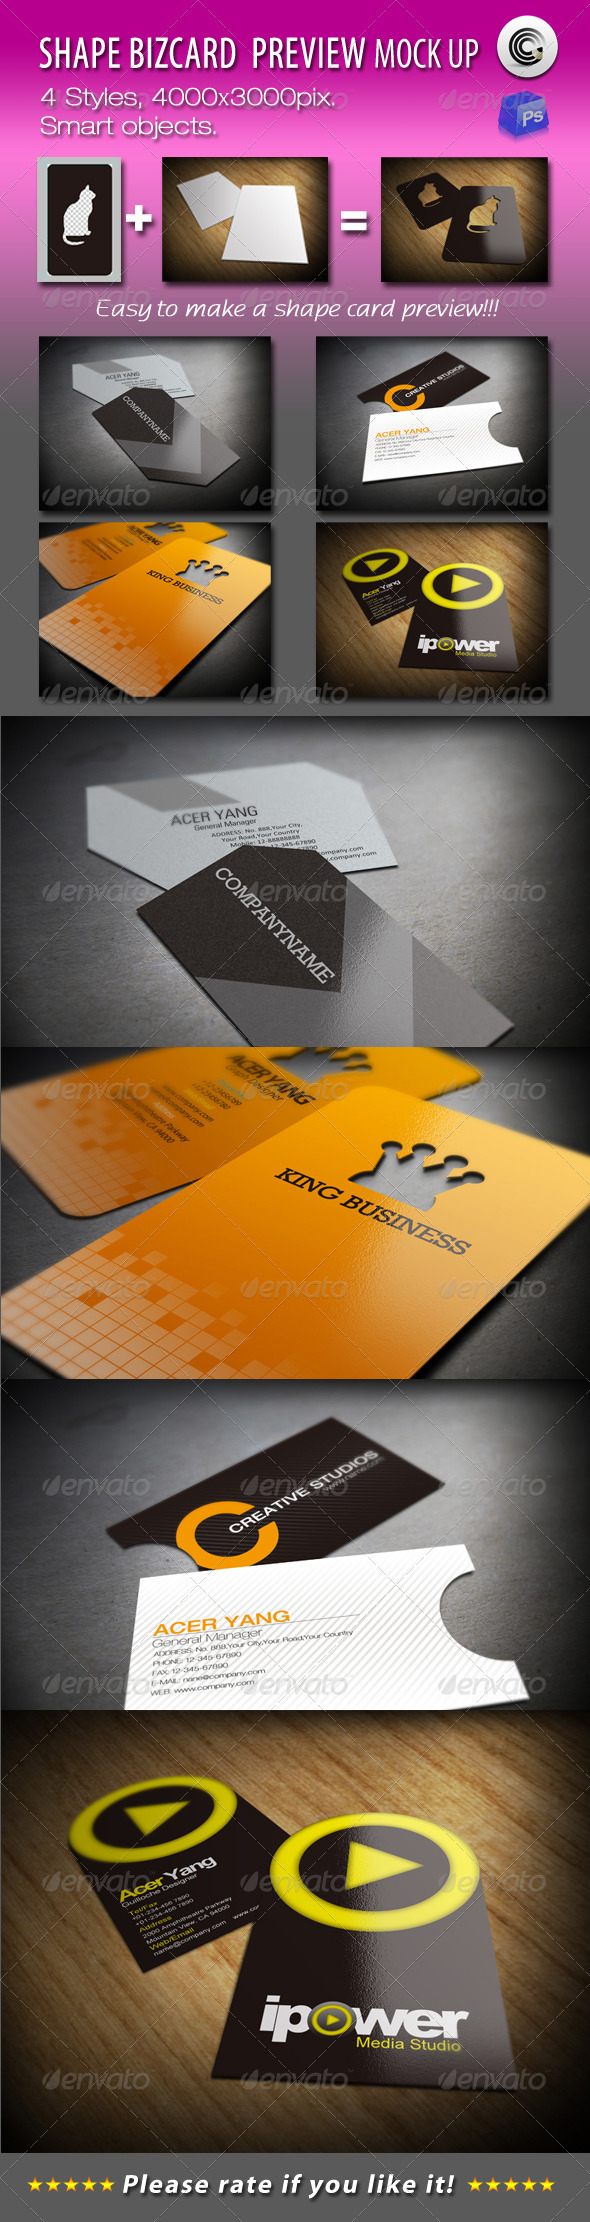 GraphicRiver Shape BizCard Preview Mock-ups 751908